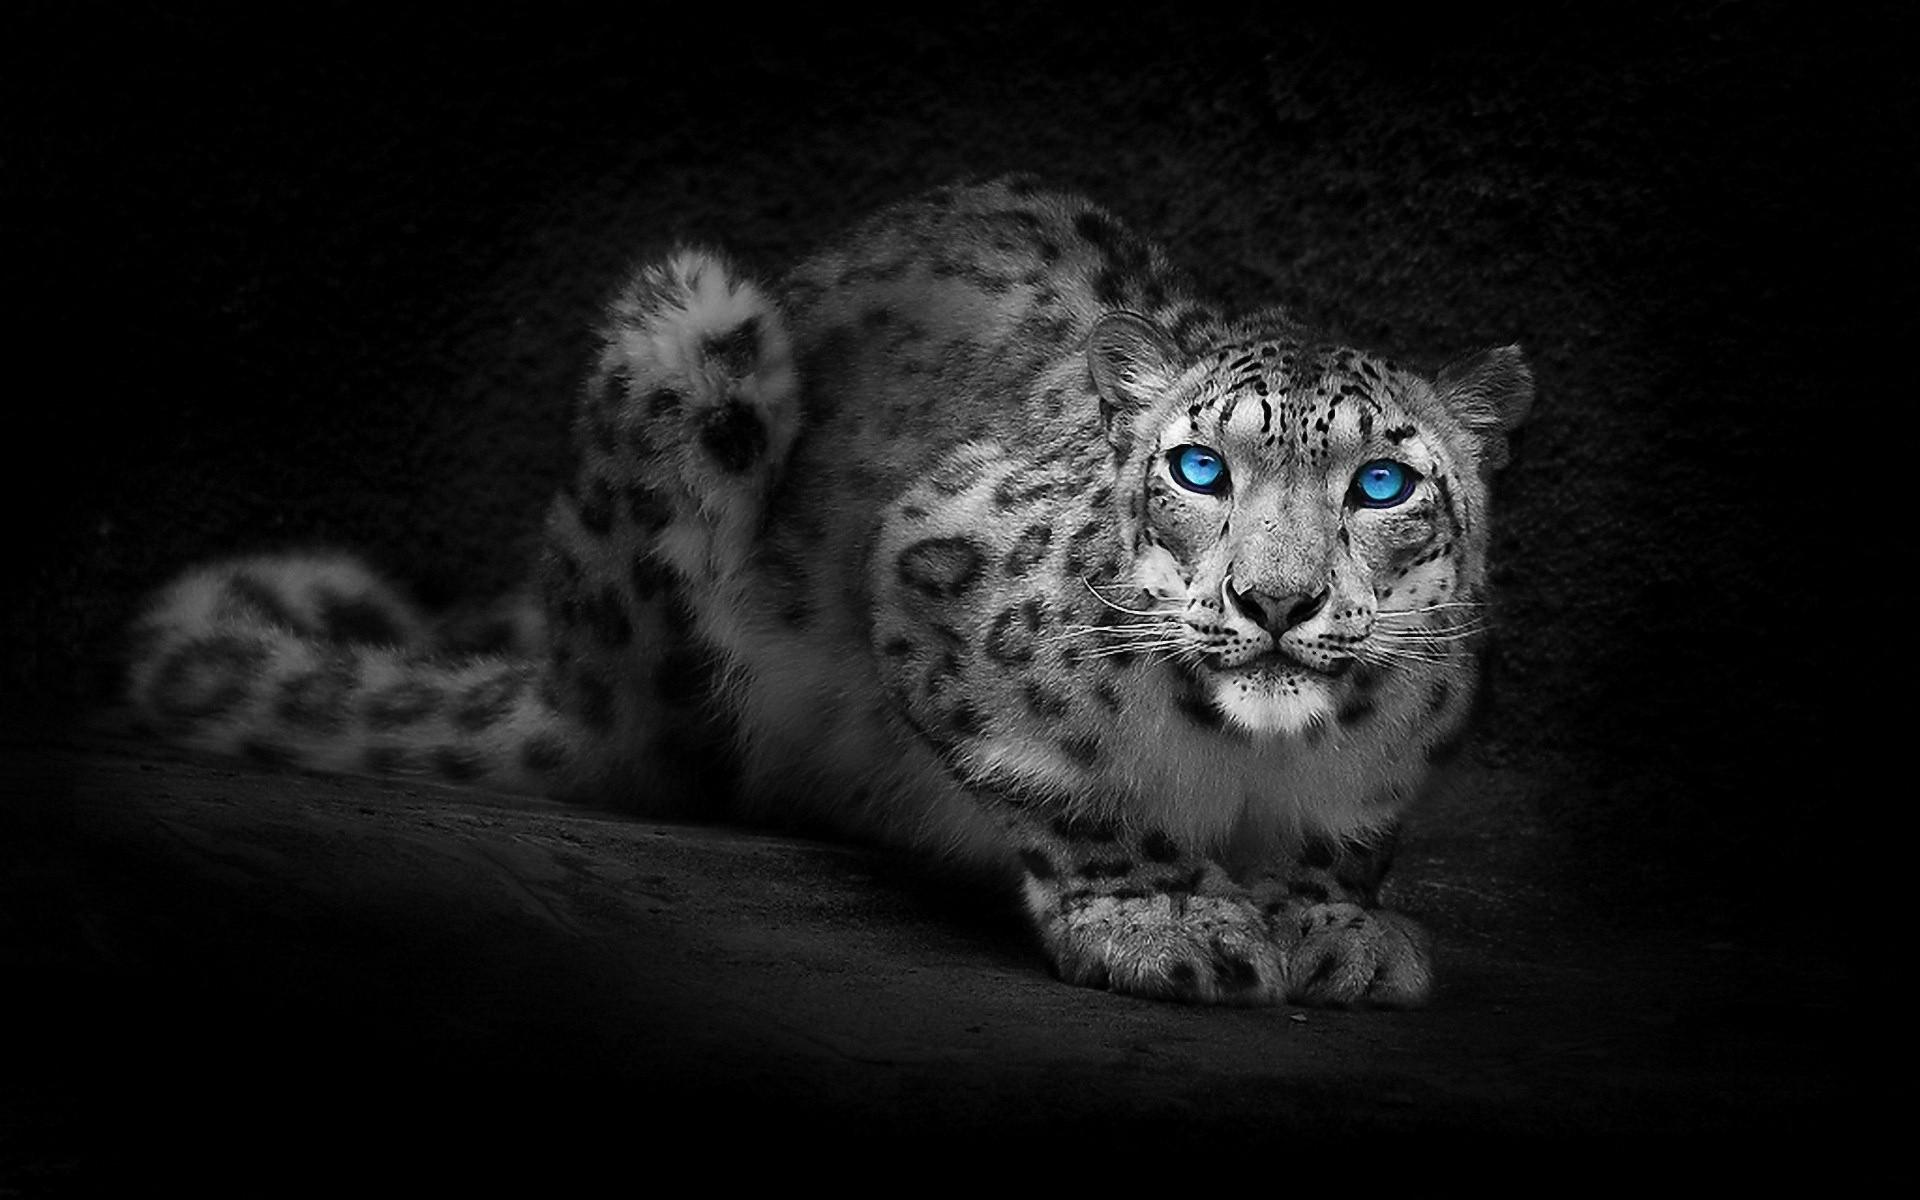 Snow leopard hd wallpaper background image 1920x1200 - Animal black background wallpaper ...